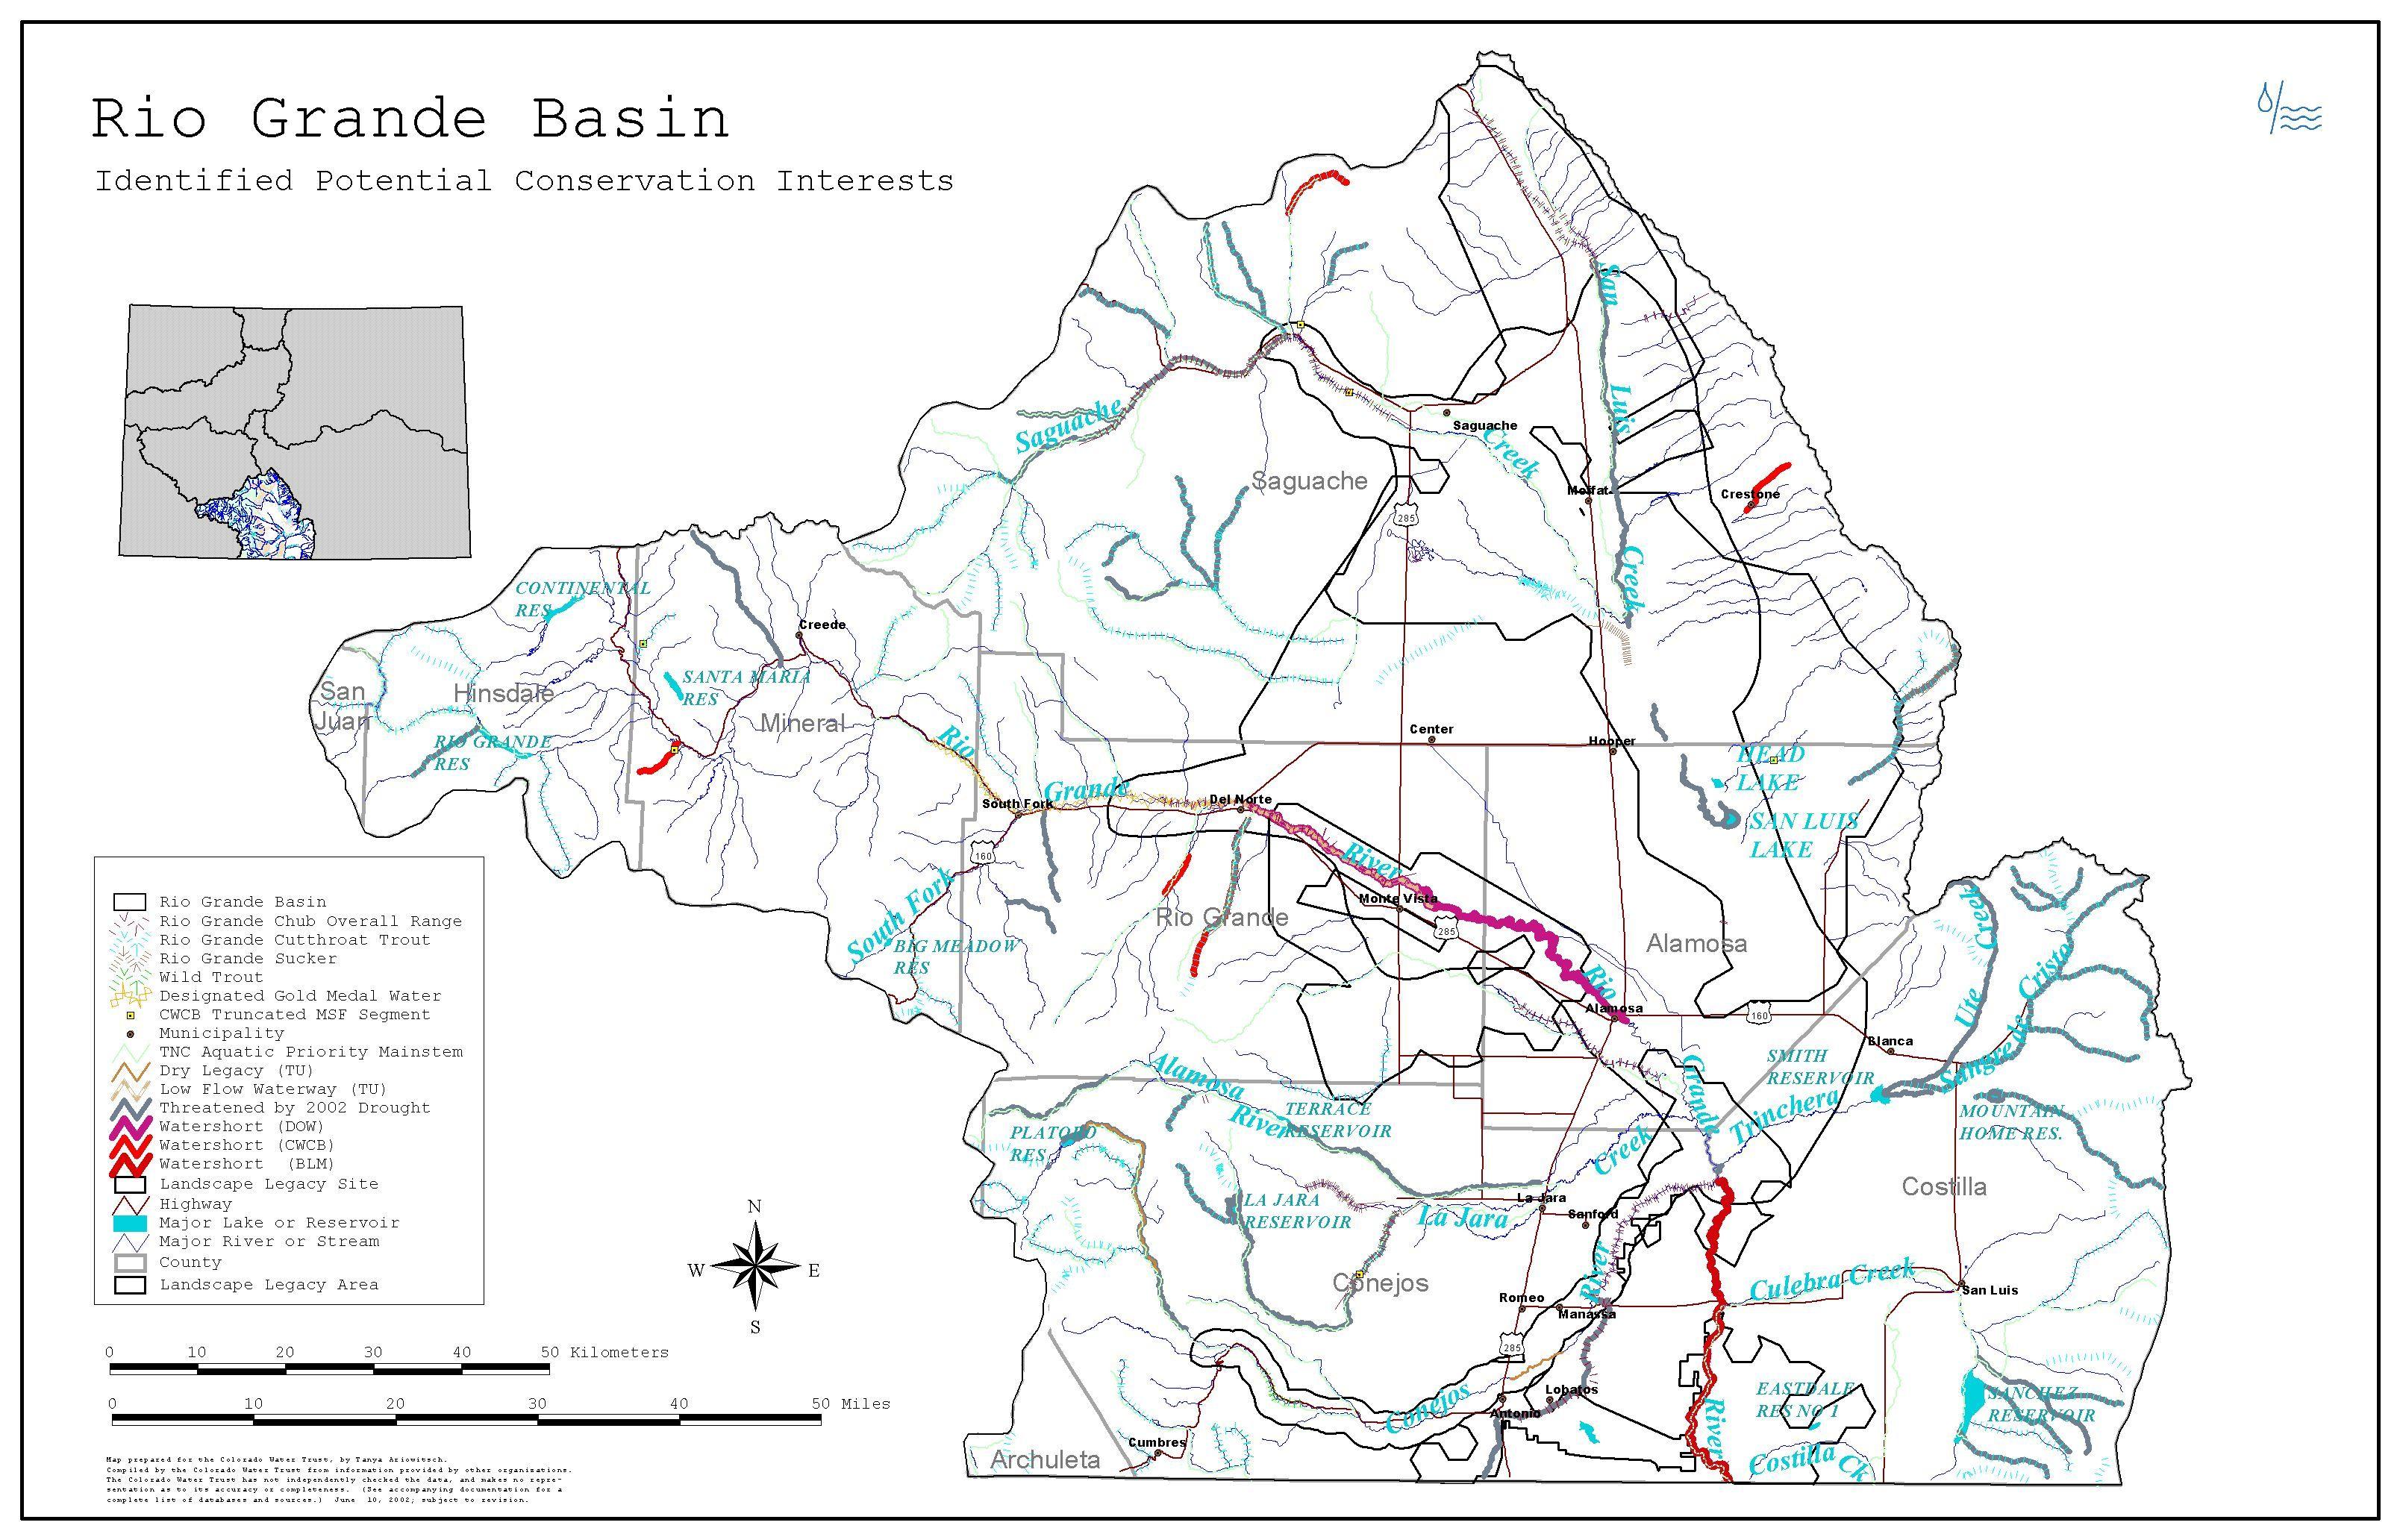 Rio Grande River Basin Map Colorado Local Water Pinterest - World map rio grande river